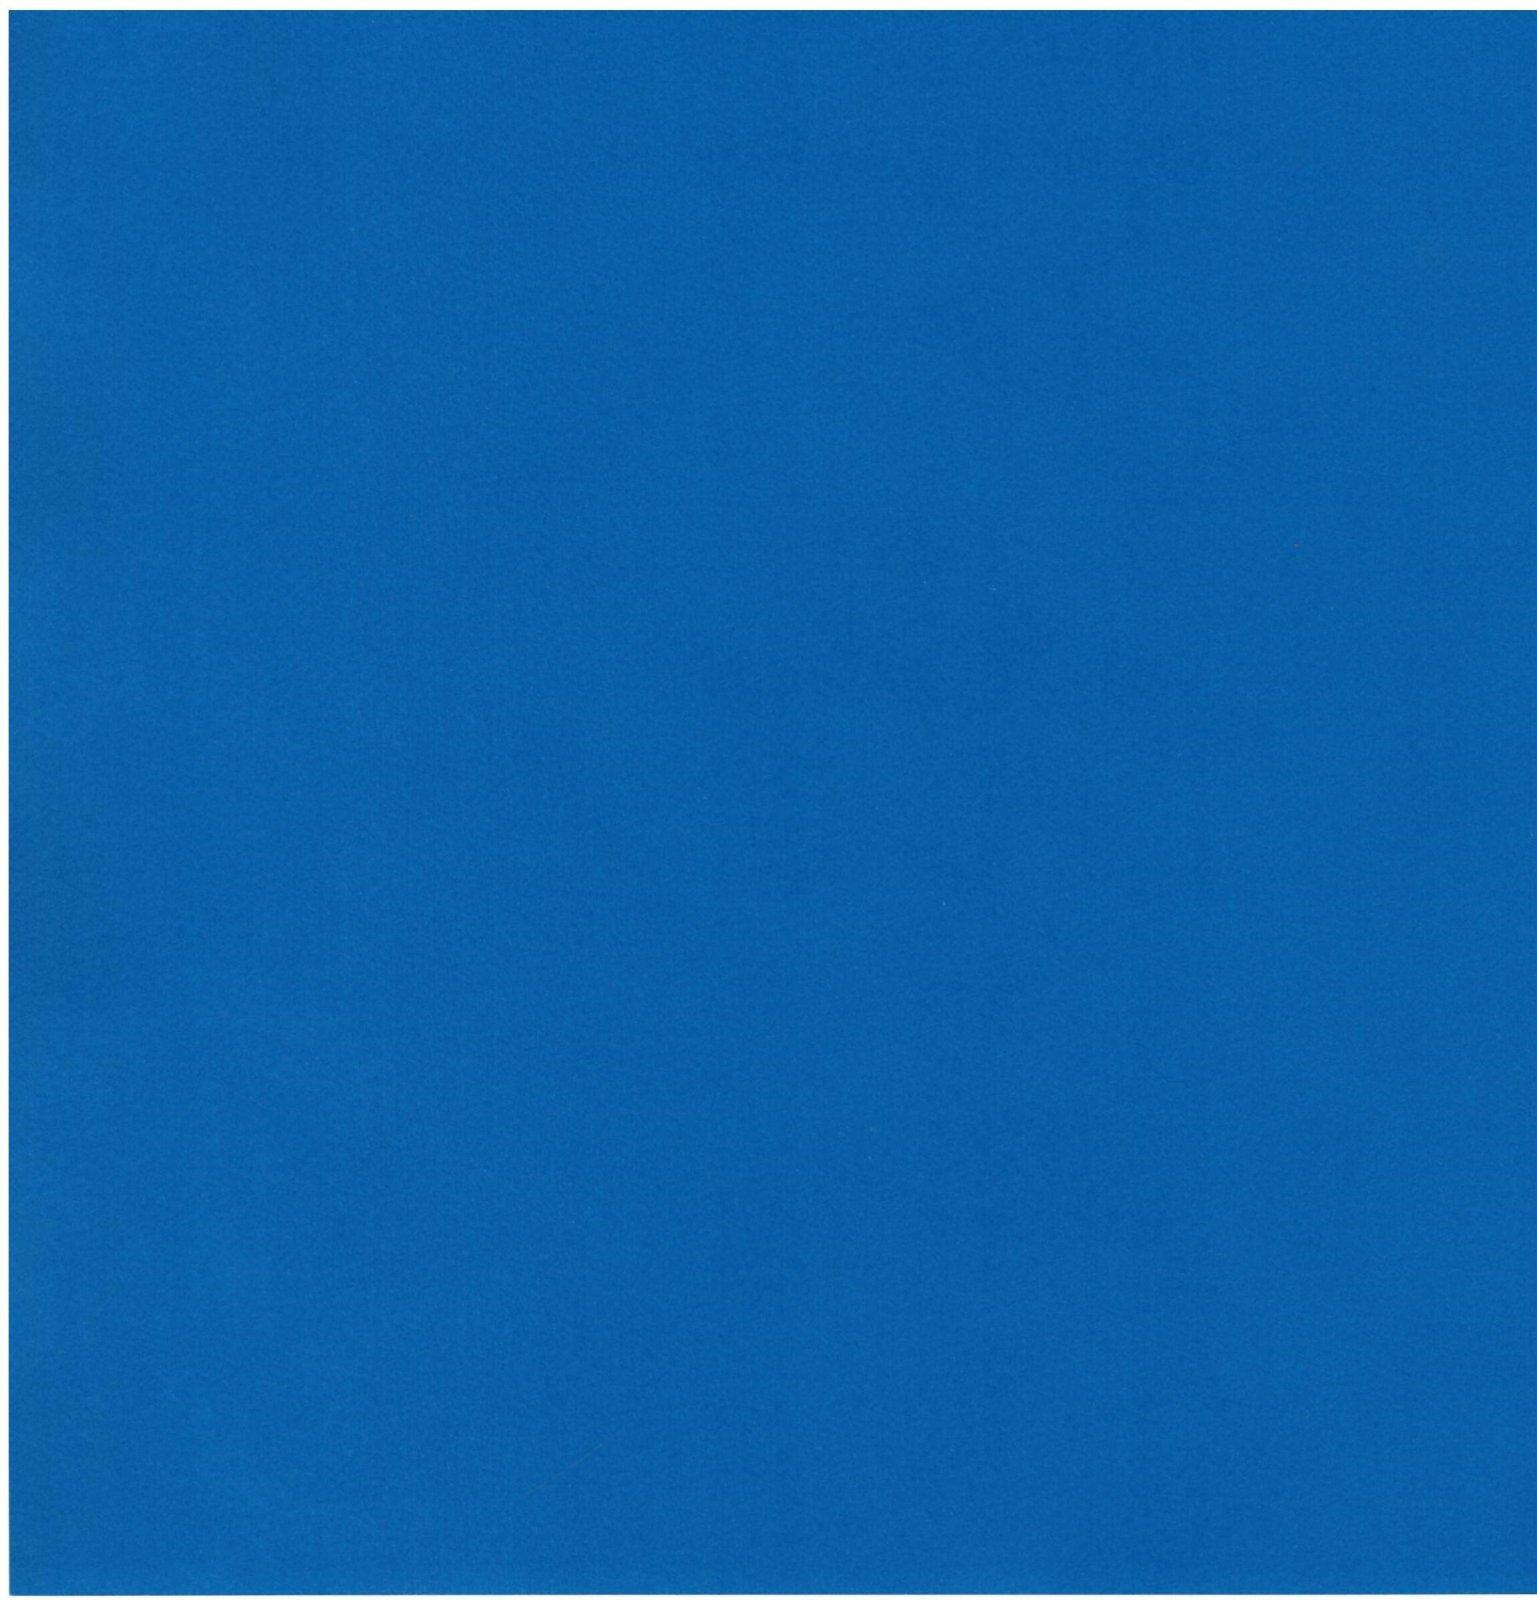 AC Cardstock 12X12 doux/lisse Bleu Marin 80lbs - Smooth Cardstock, Marine Item # 71784